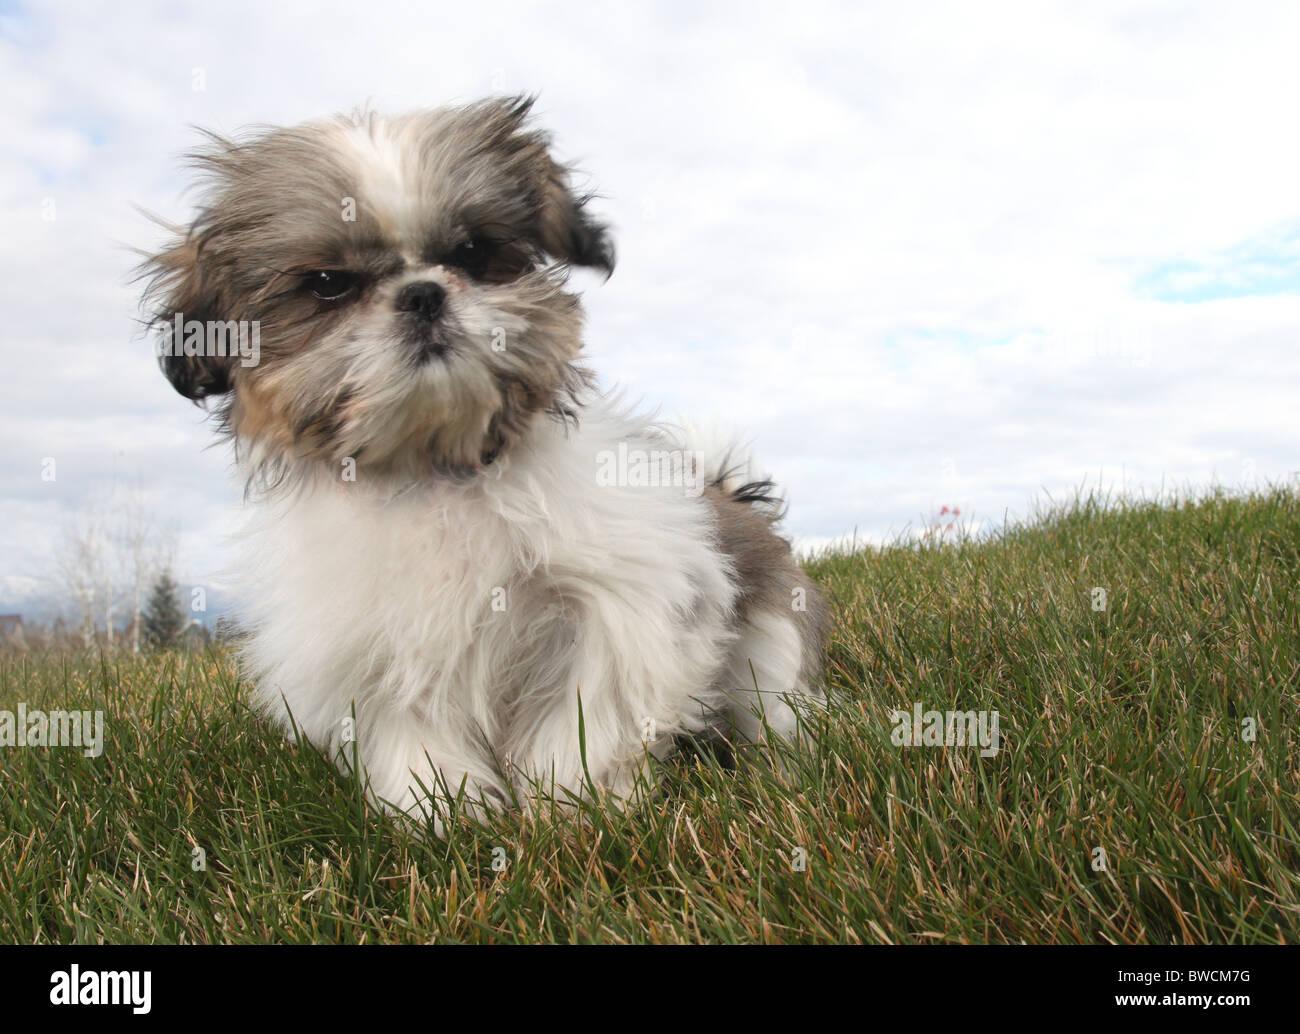 fluffy Shitsu puppy sitting on green grass - Stock Image